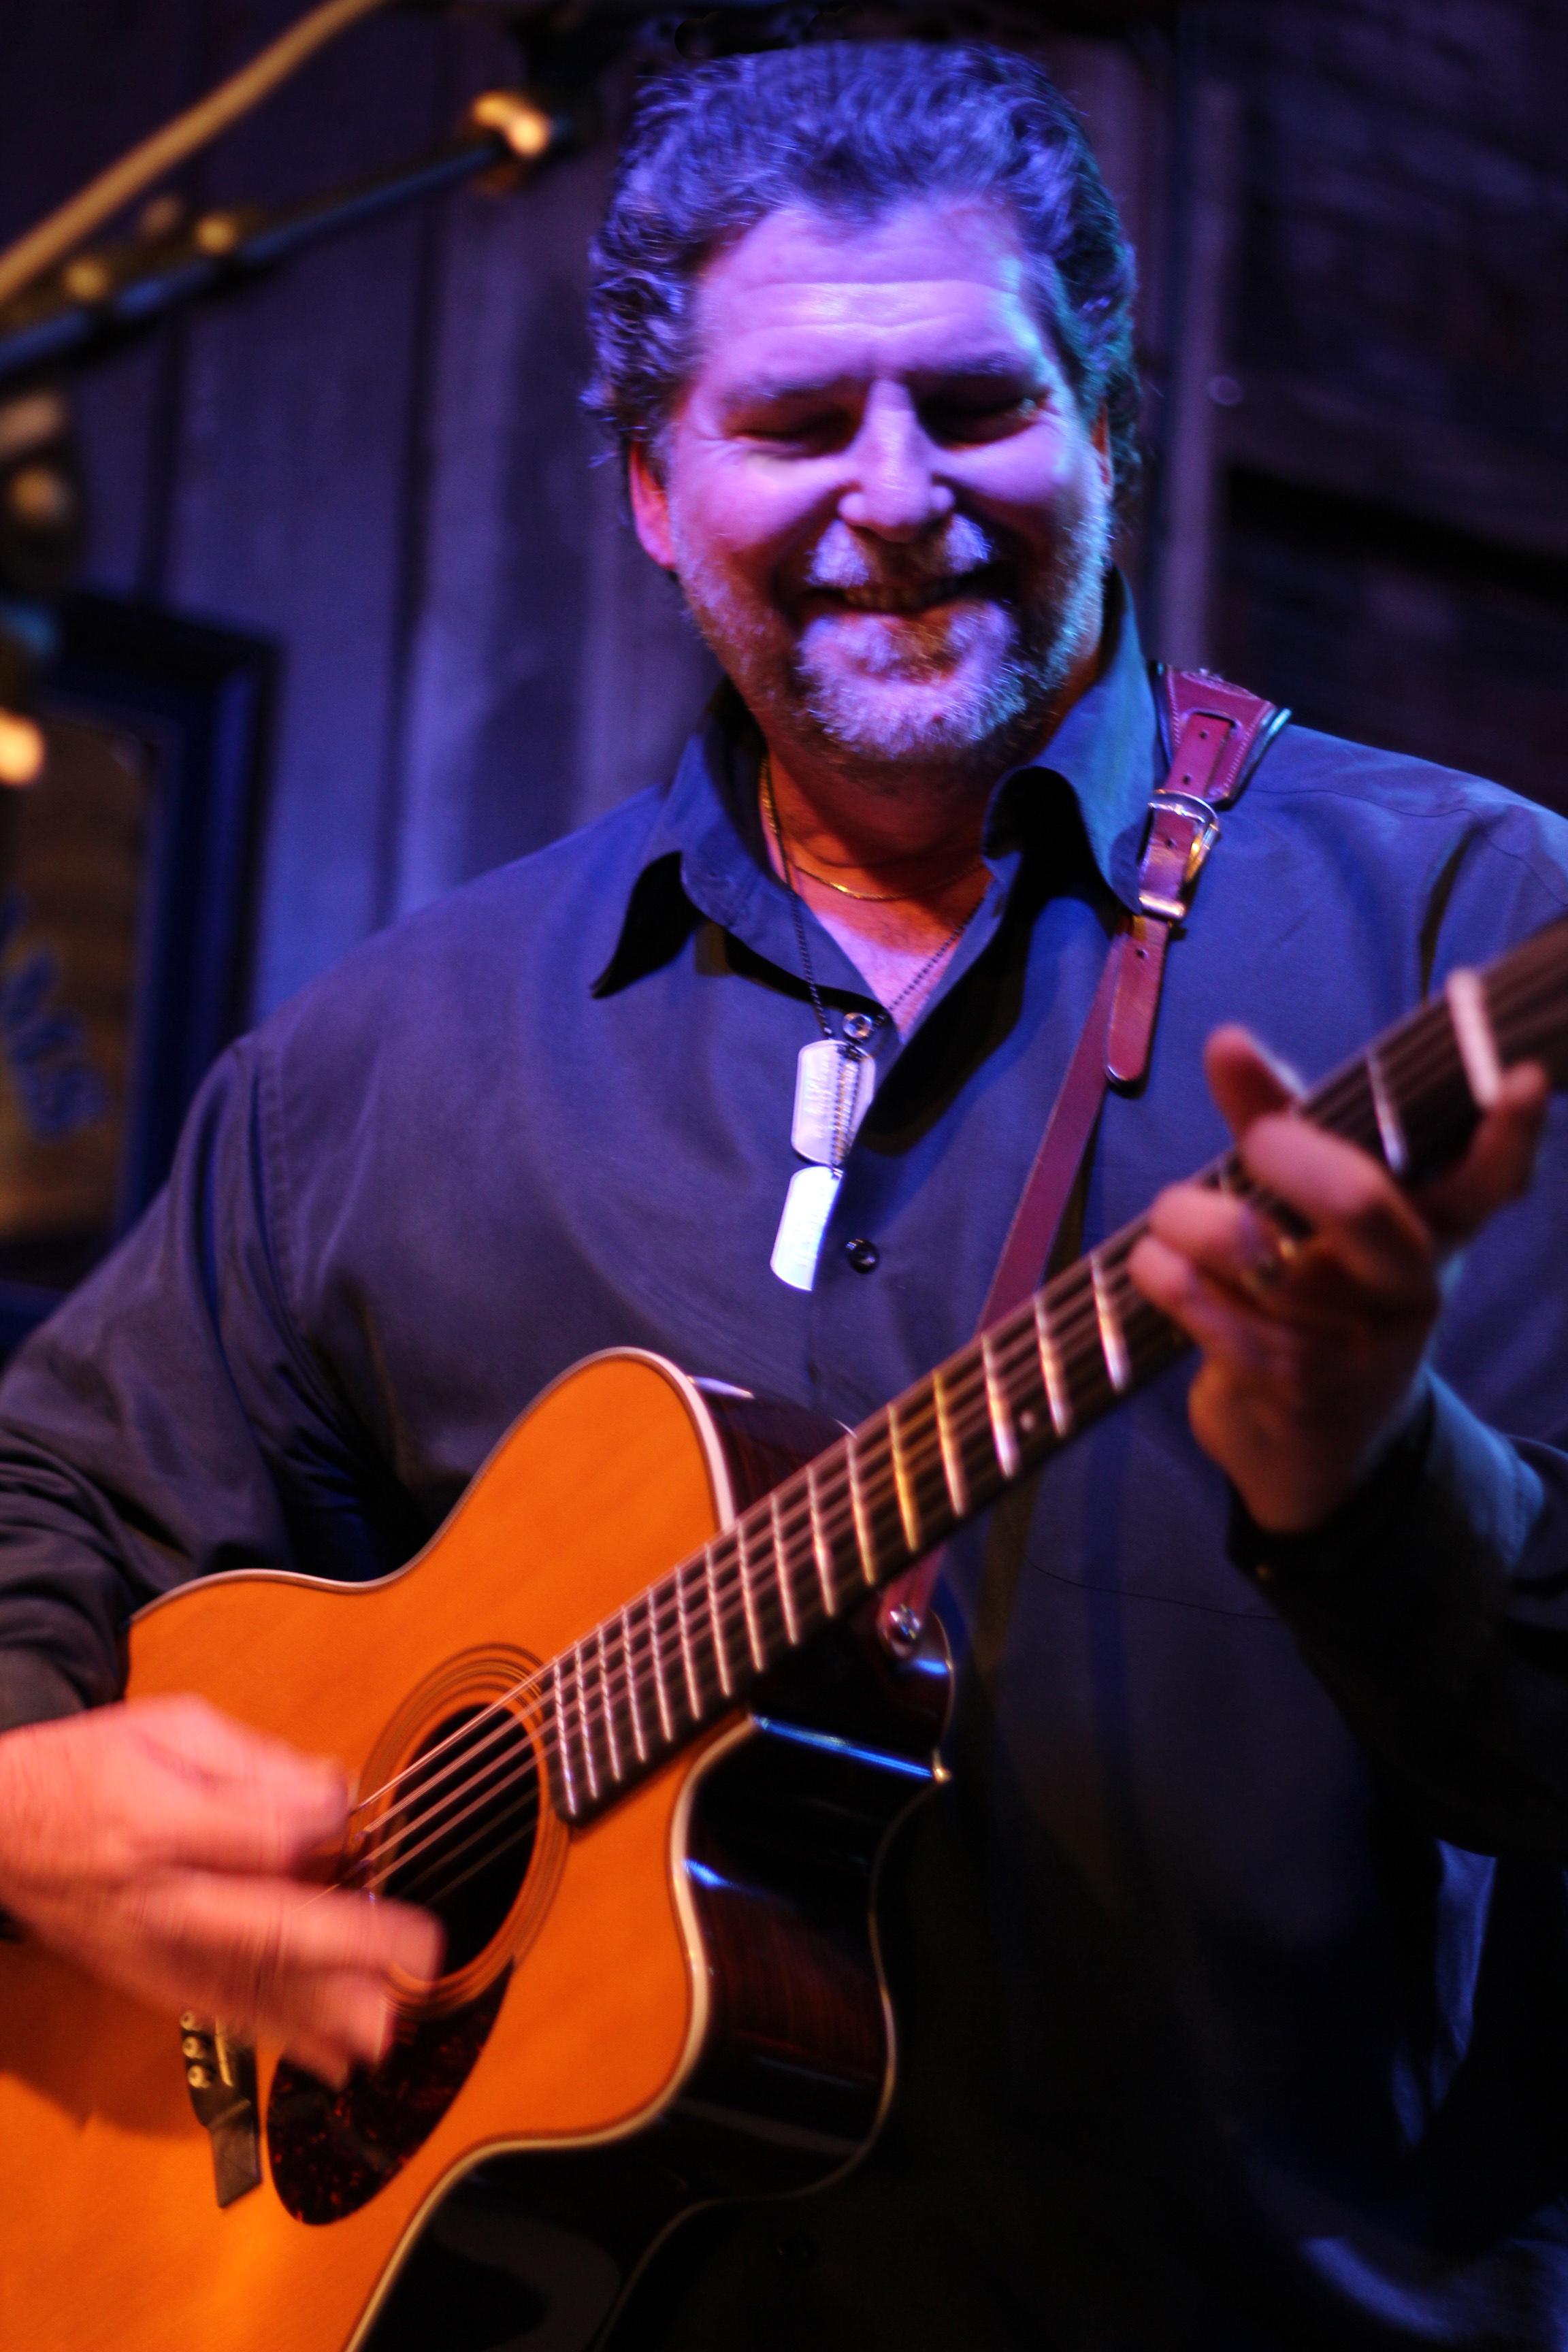 Nashville, 2012